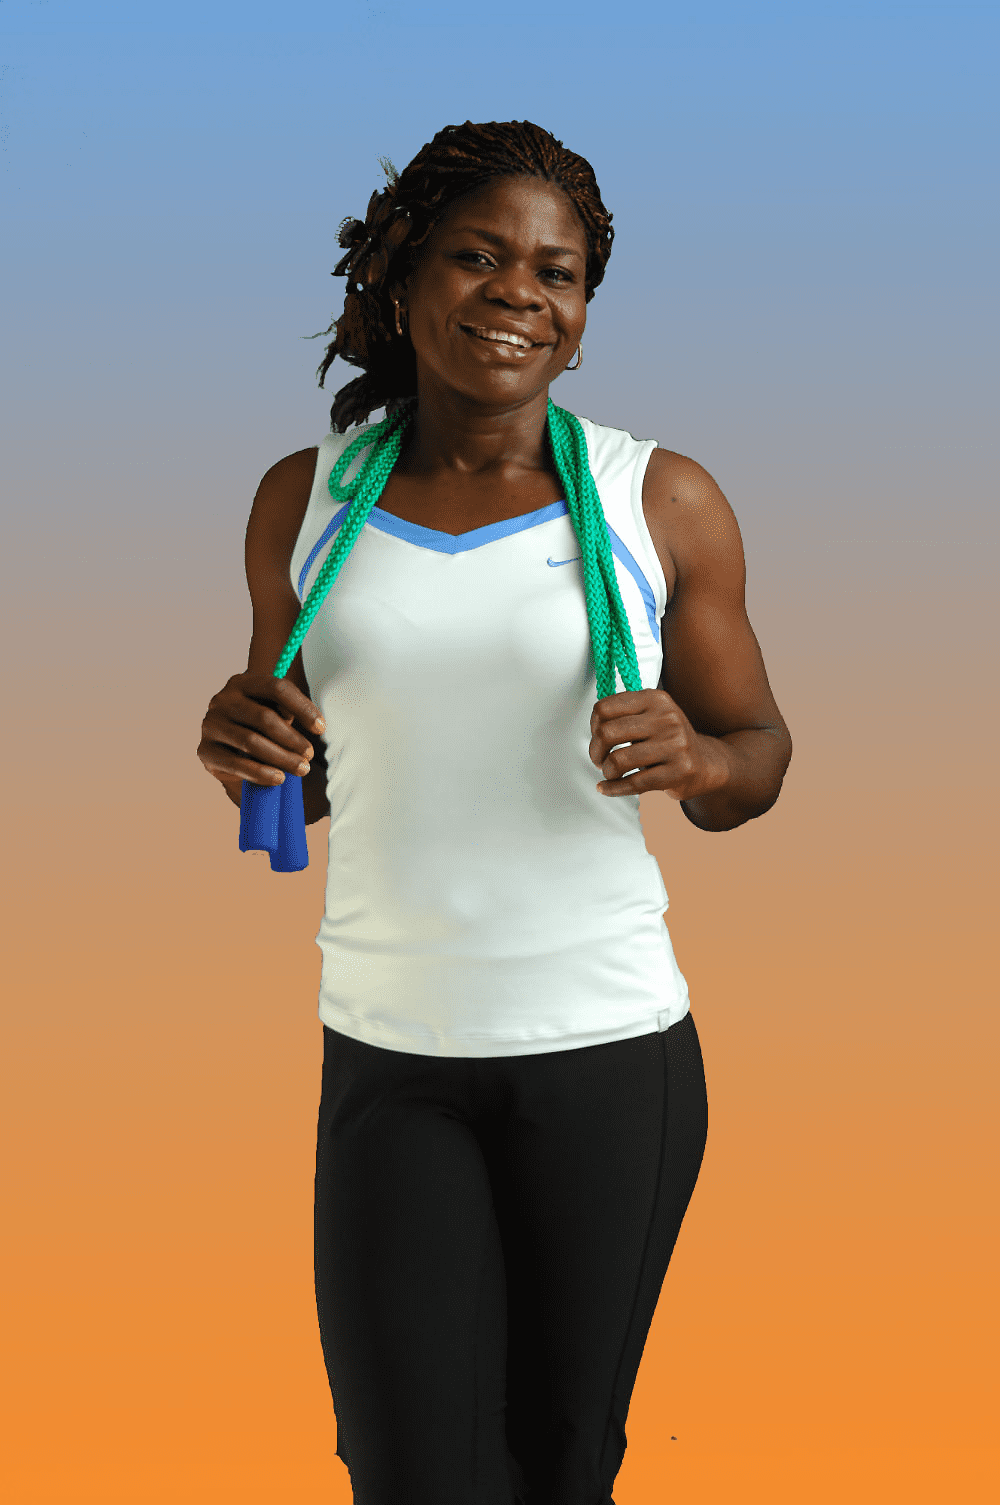 Nigerian Women Fitness Esta Morenikeji